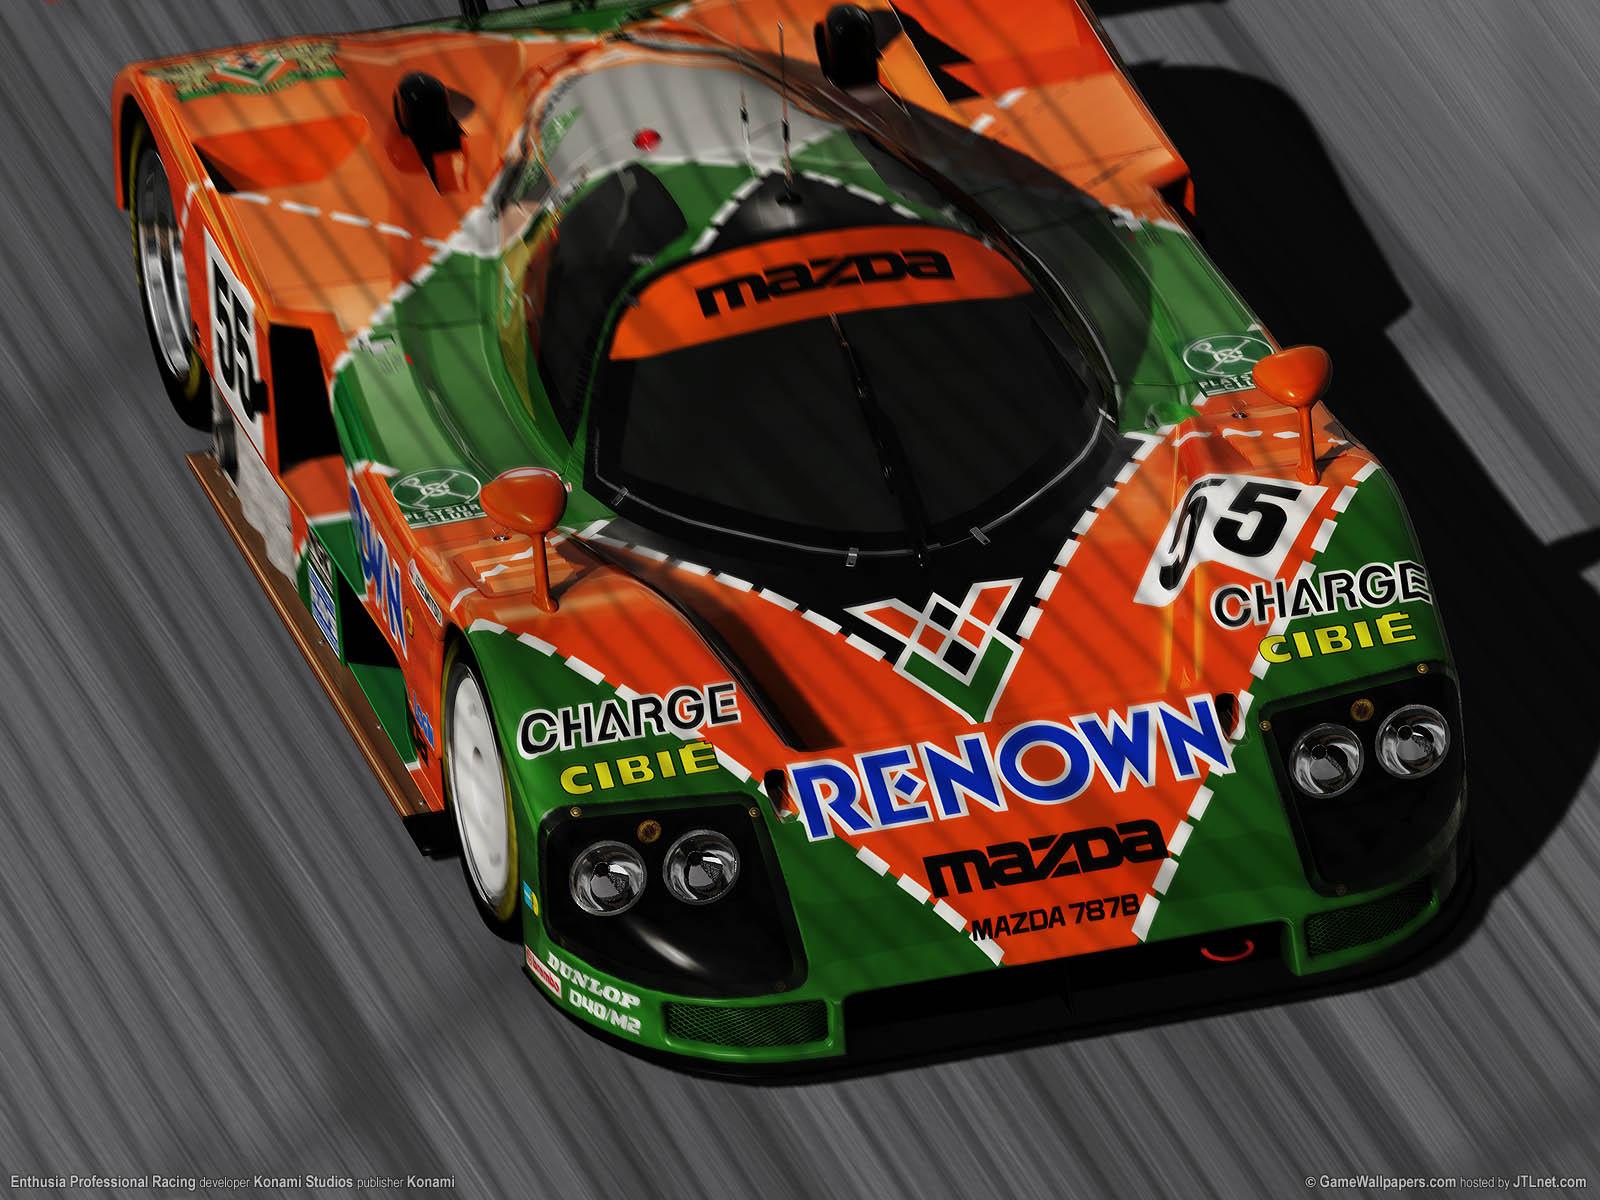 Enthusia Professional Racing Hintergrundbild 01 1600x1200